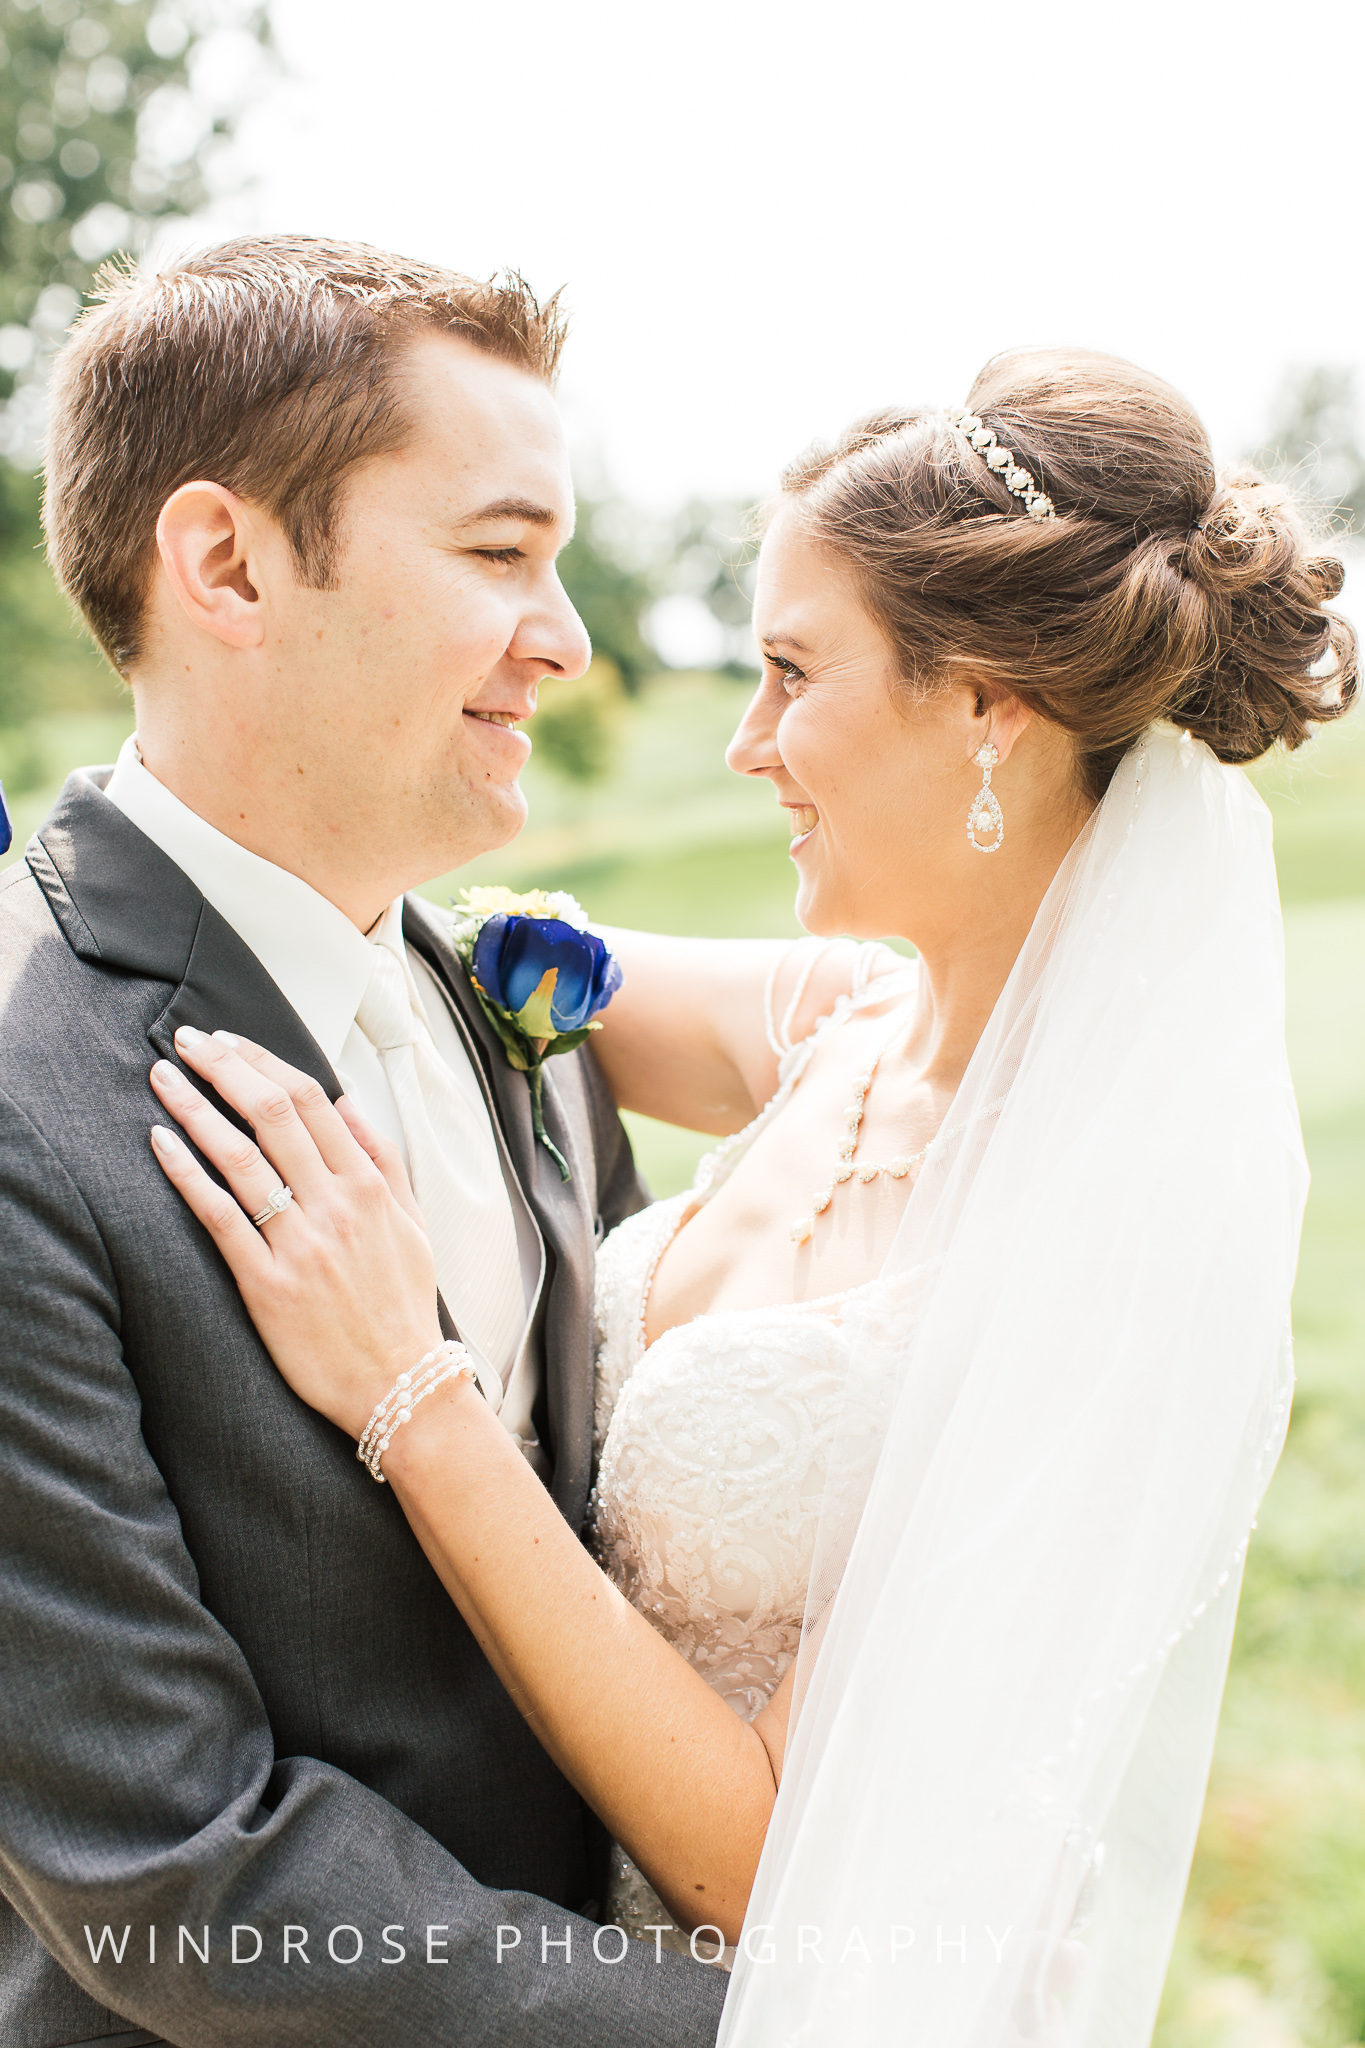 La-Crosse-Country-Club-Wedding-Minnesota-Wedding-Photographer-7.jpg